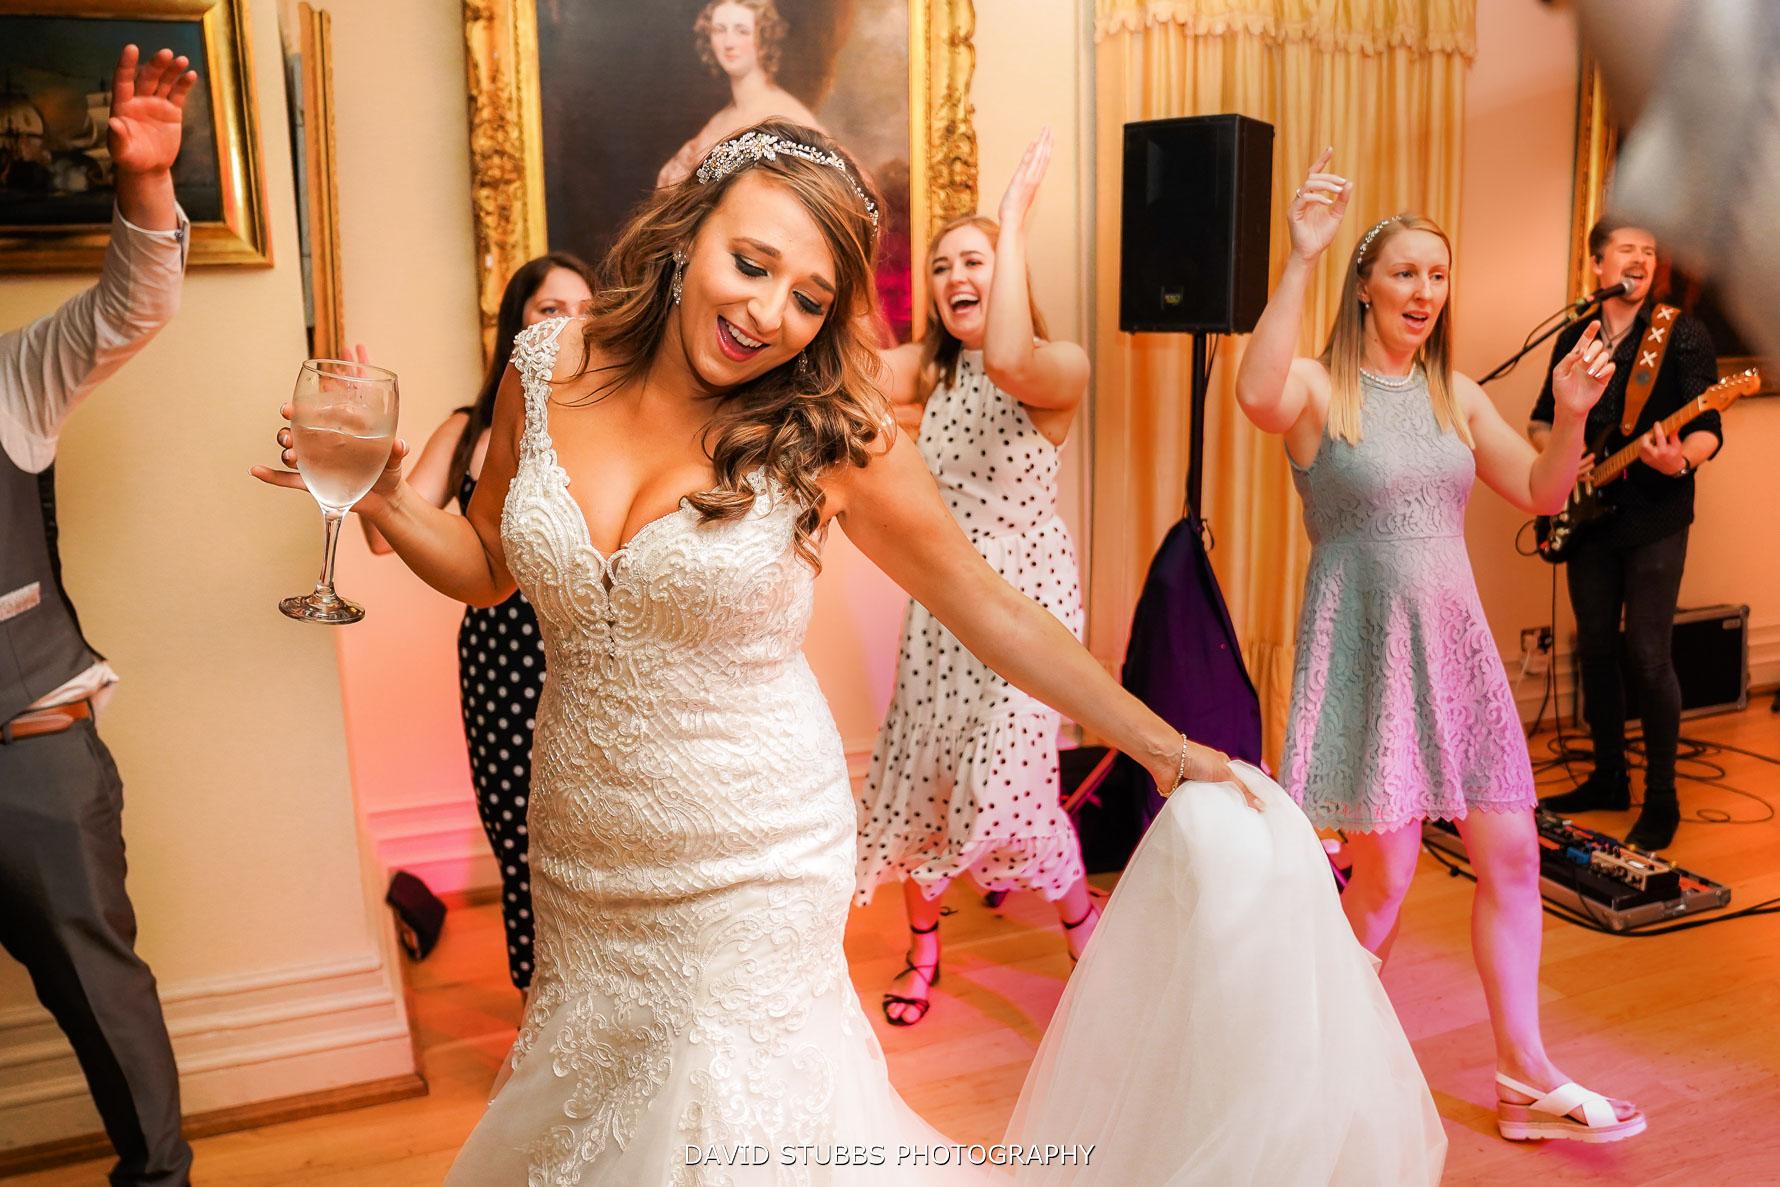 bide dancing at her wedding